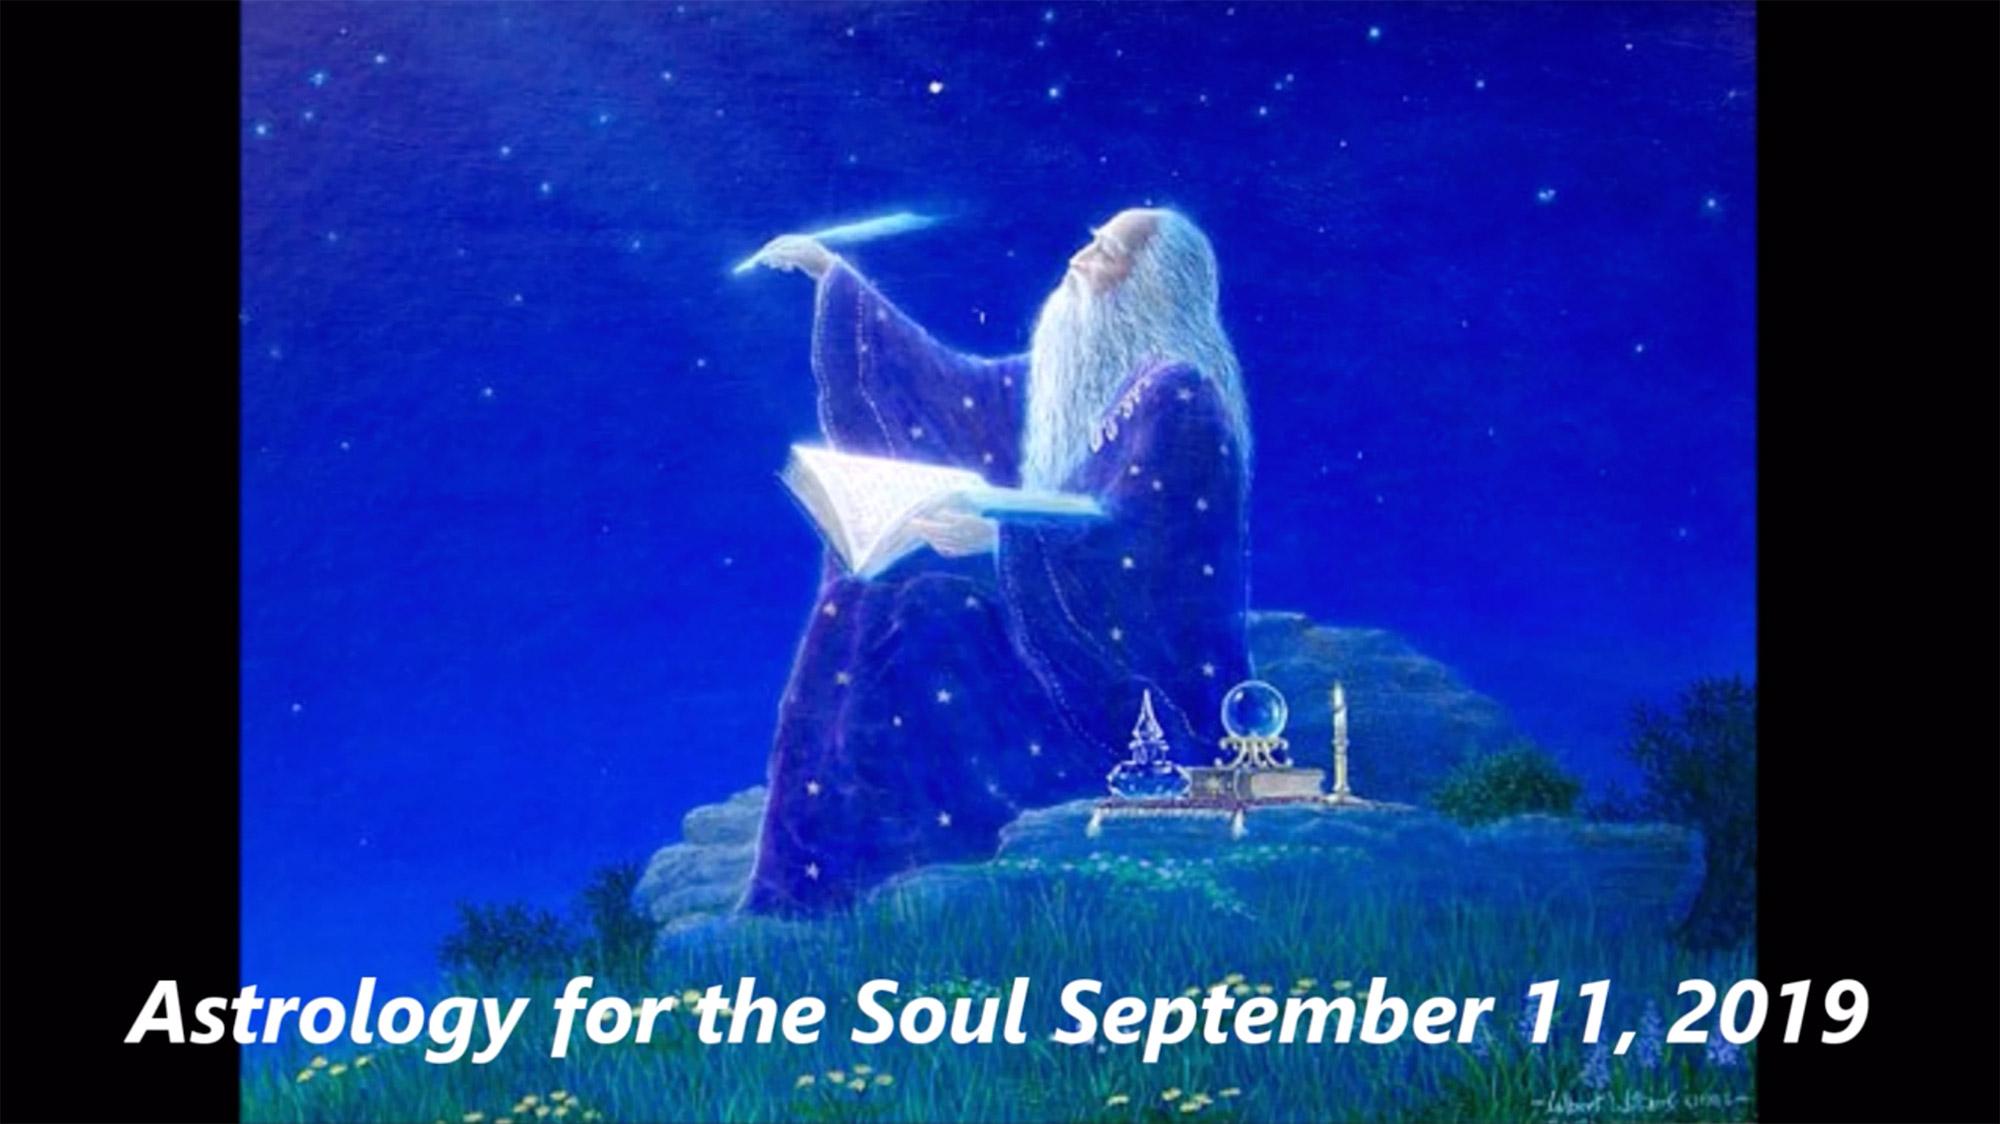 Sept 11th, 2019 – Pele Report, Astrology Forecast